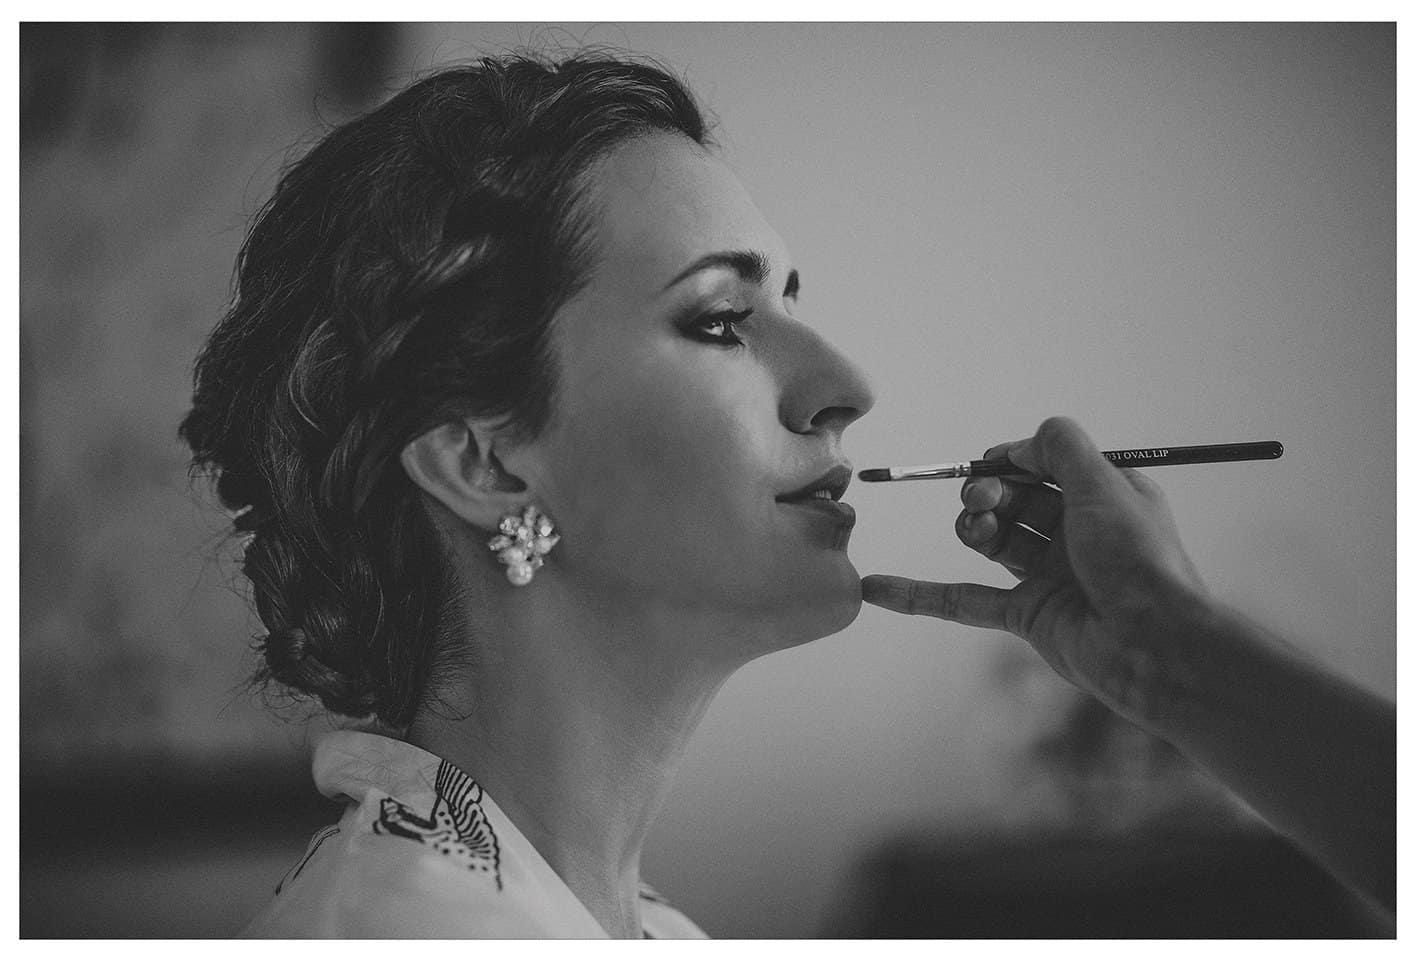 A make up artist applies lipstick to the brides lips